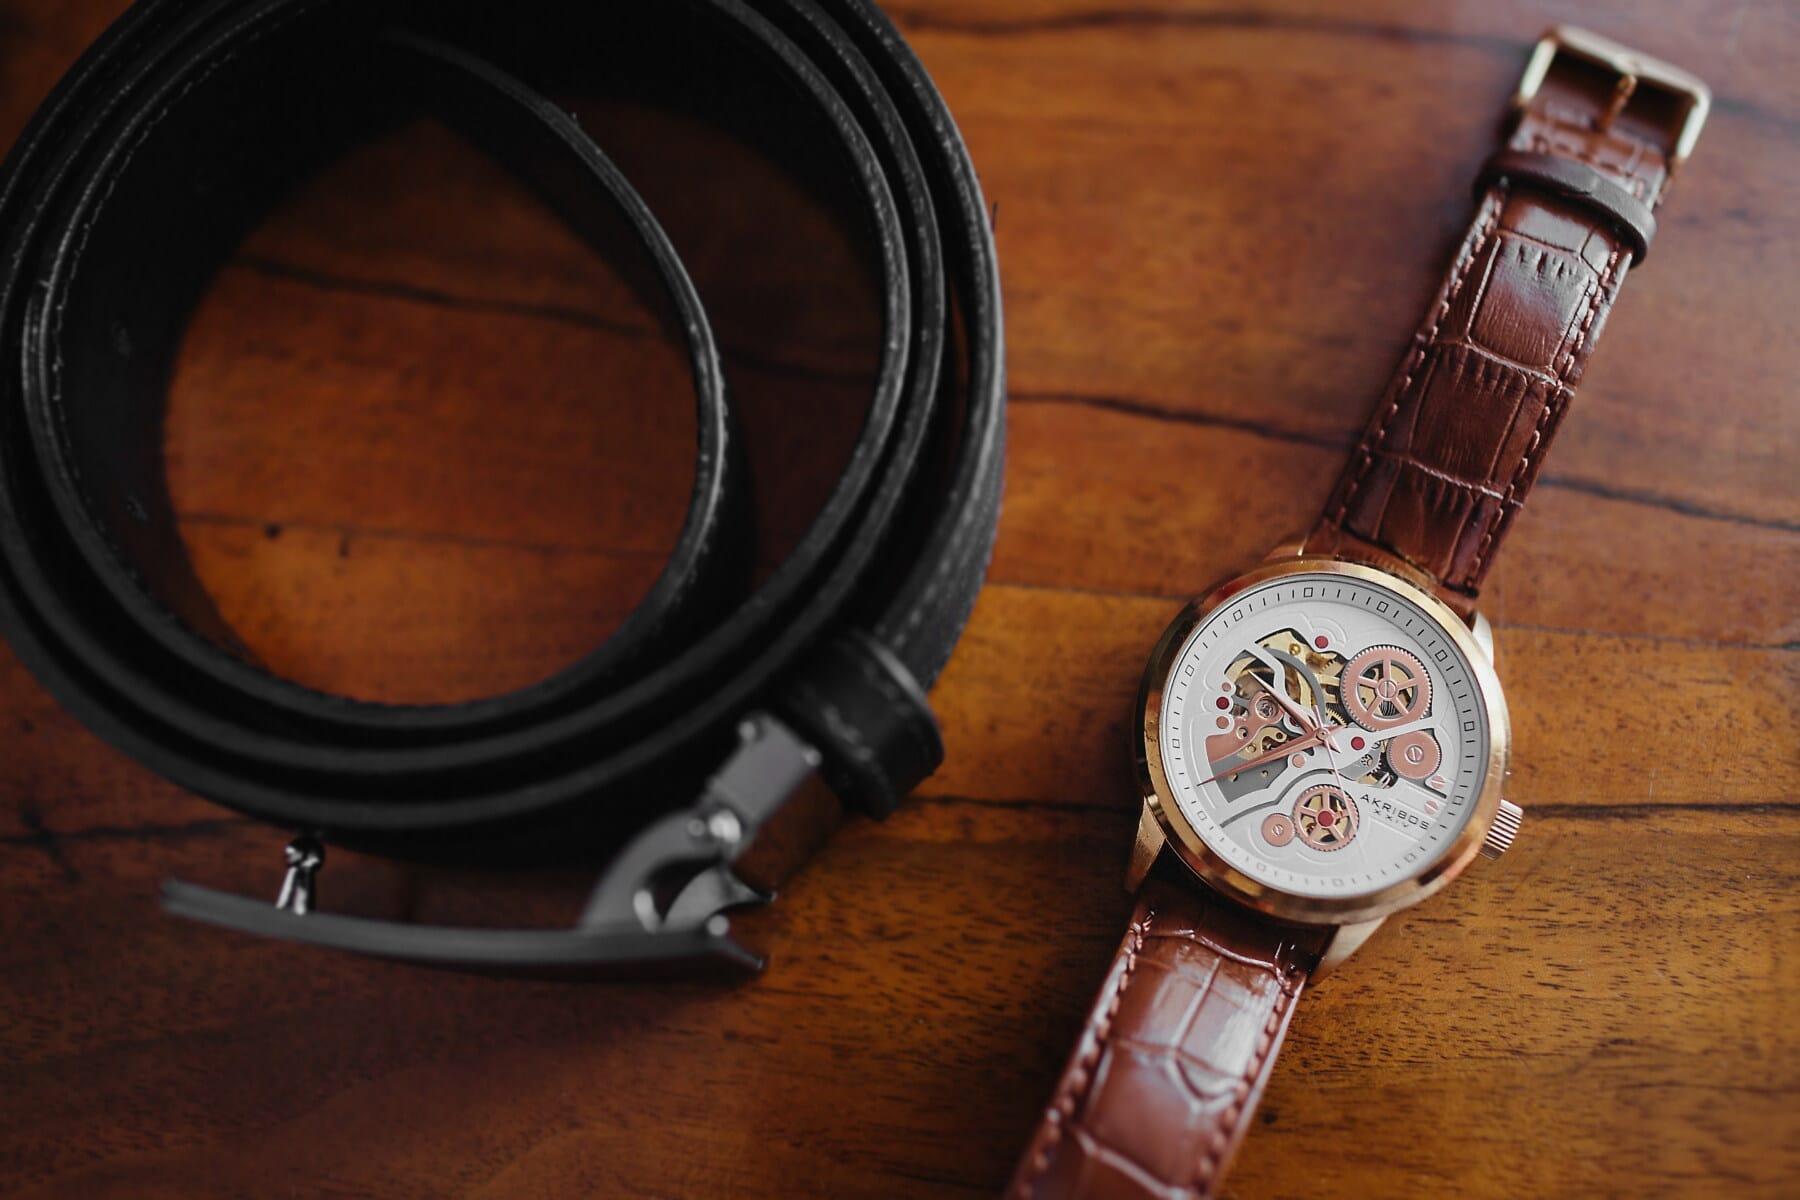 wristwatch, modern, belt, leather, light brown, wood, retro, old, vintage, time